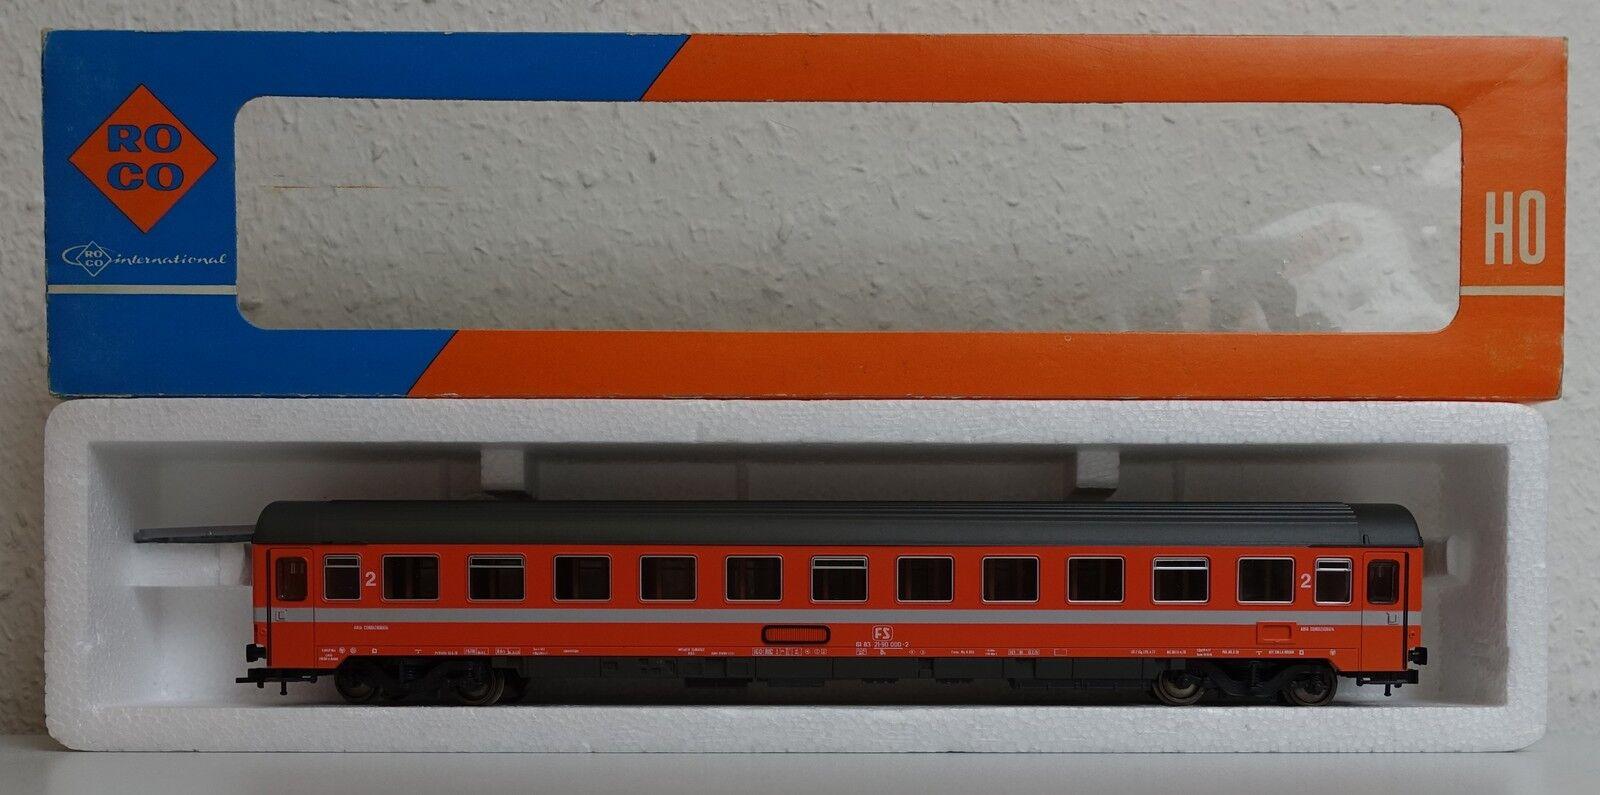 Roco 44310 FS Eurofirma Orange 2. Klasse Personenwaggon Italien - selten  | Am praktischsten